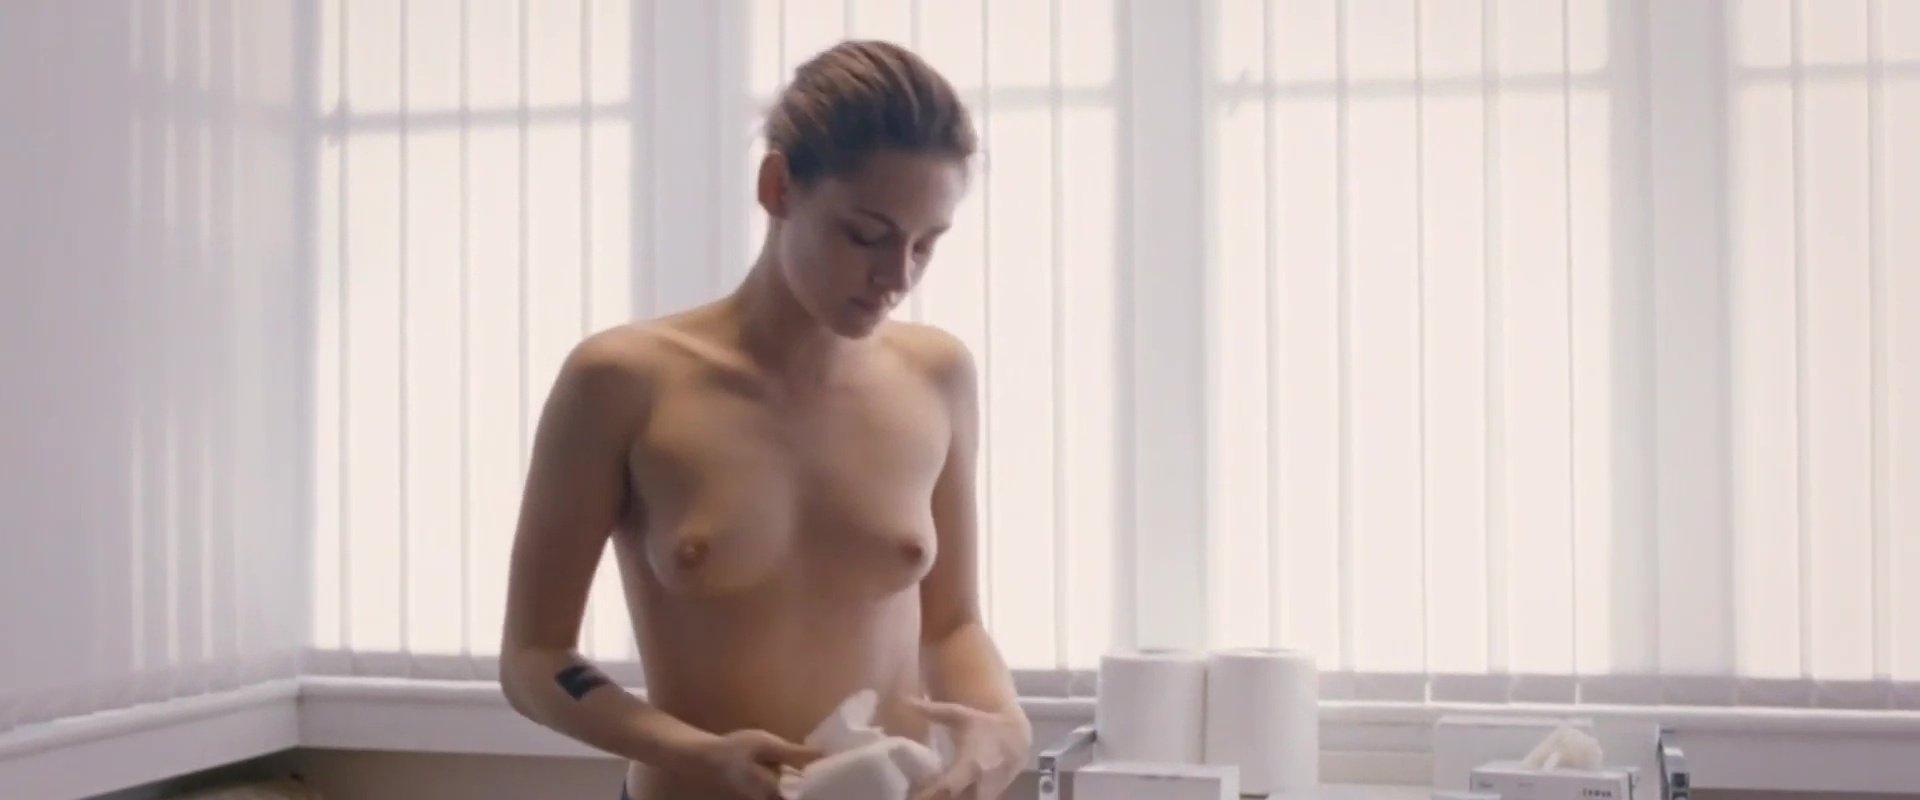 Topless kristen stewart nude